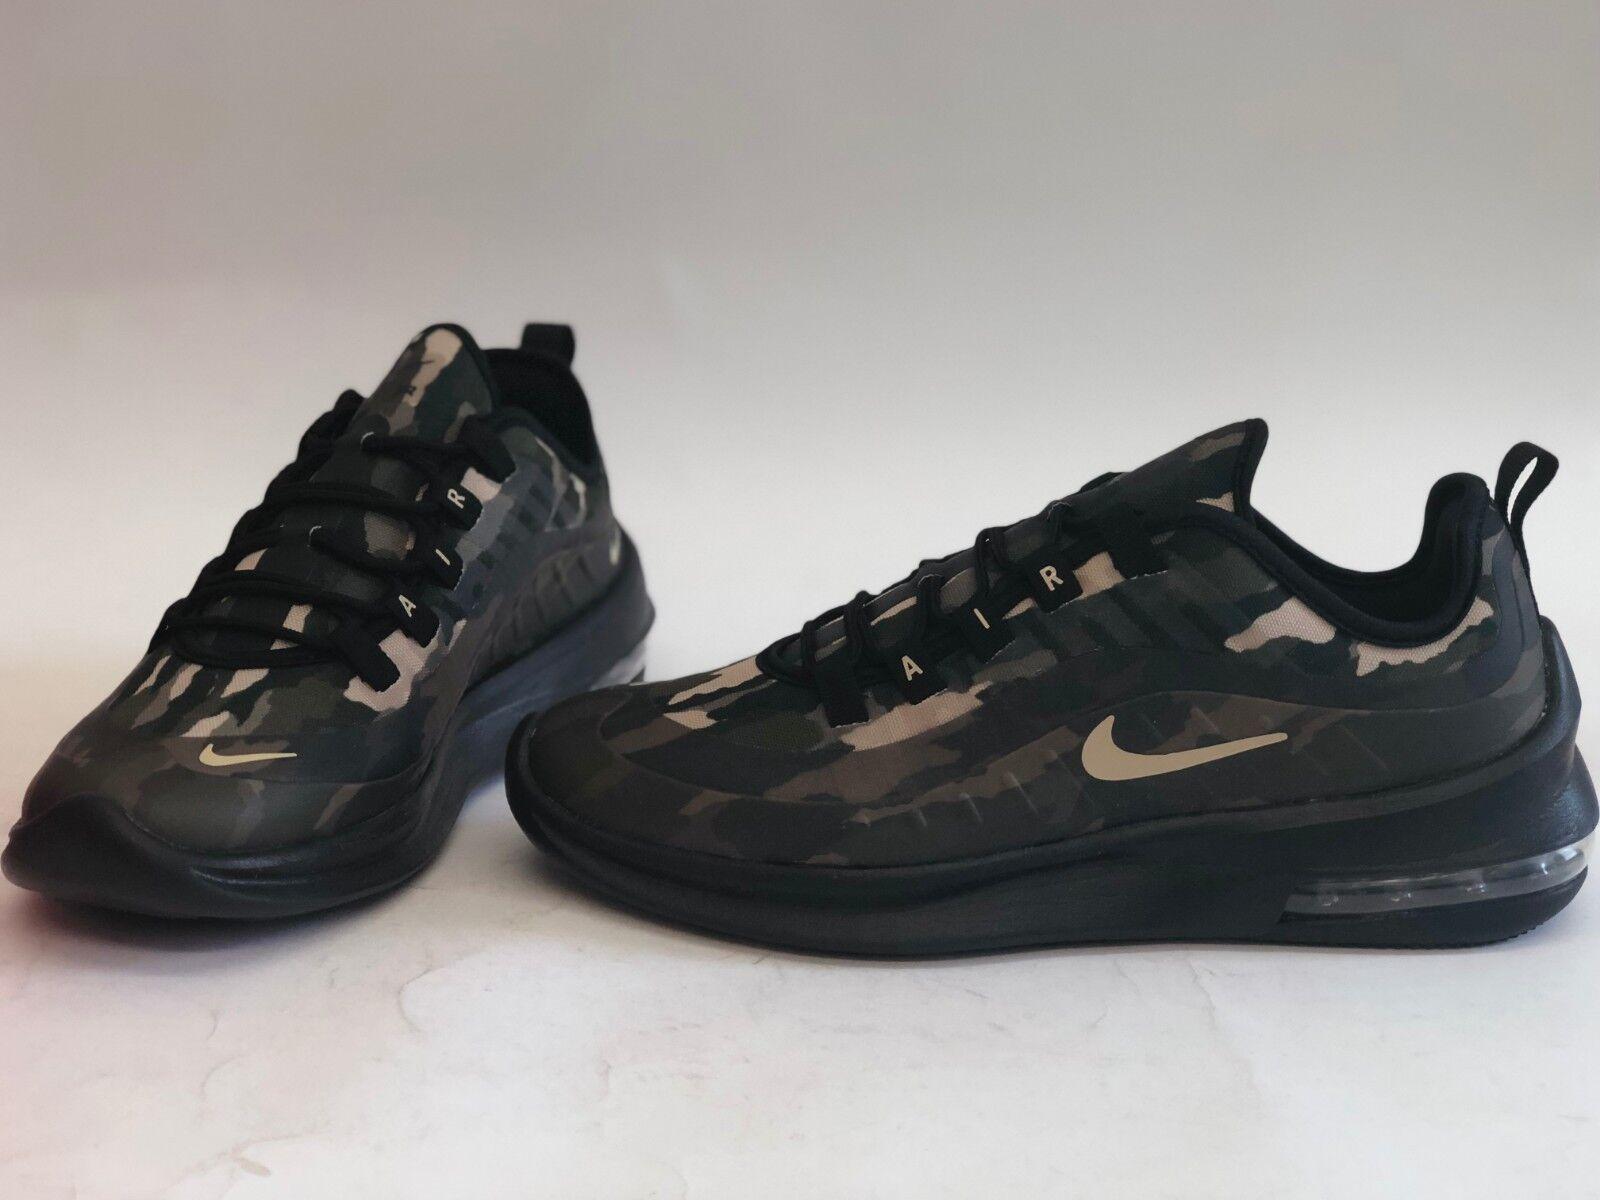 Nike air max nib Uomo dimensioni 10,5 10,5 10,5 asse prem scarpe mimetico aa2148-002 3e43d1